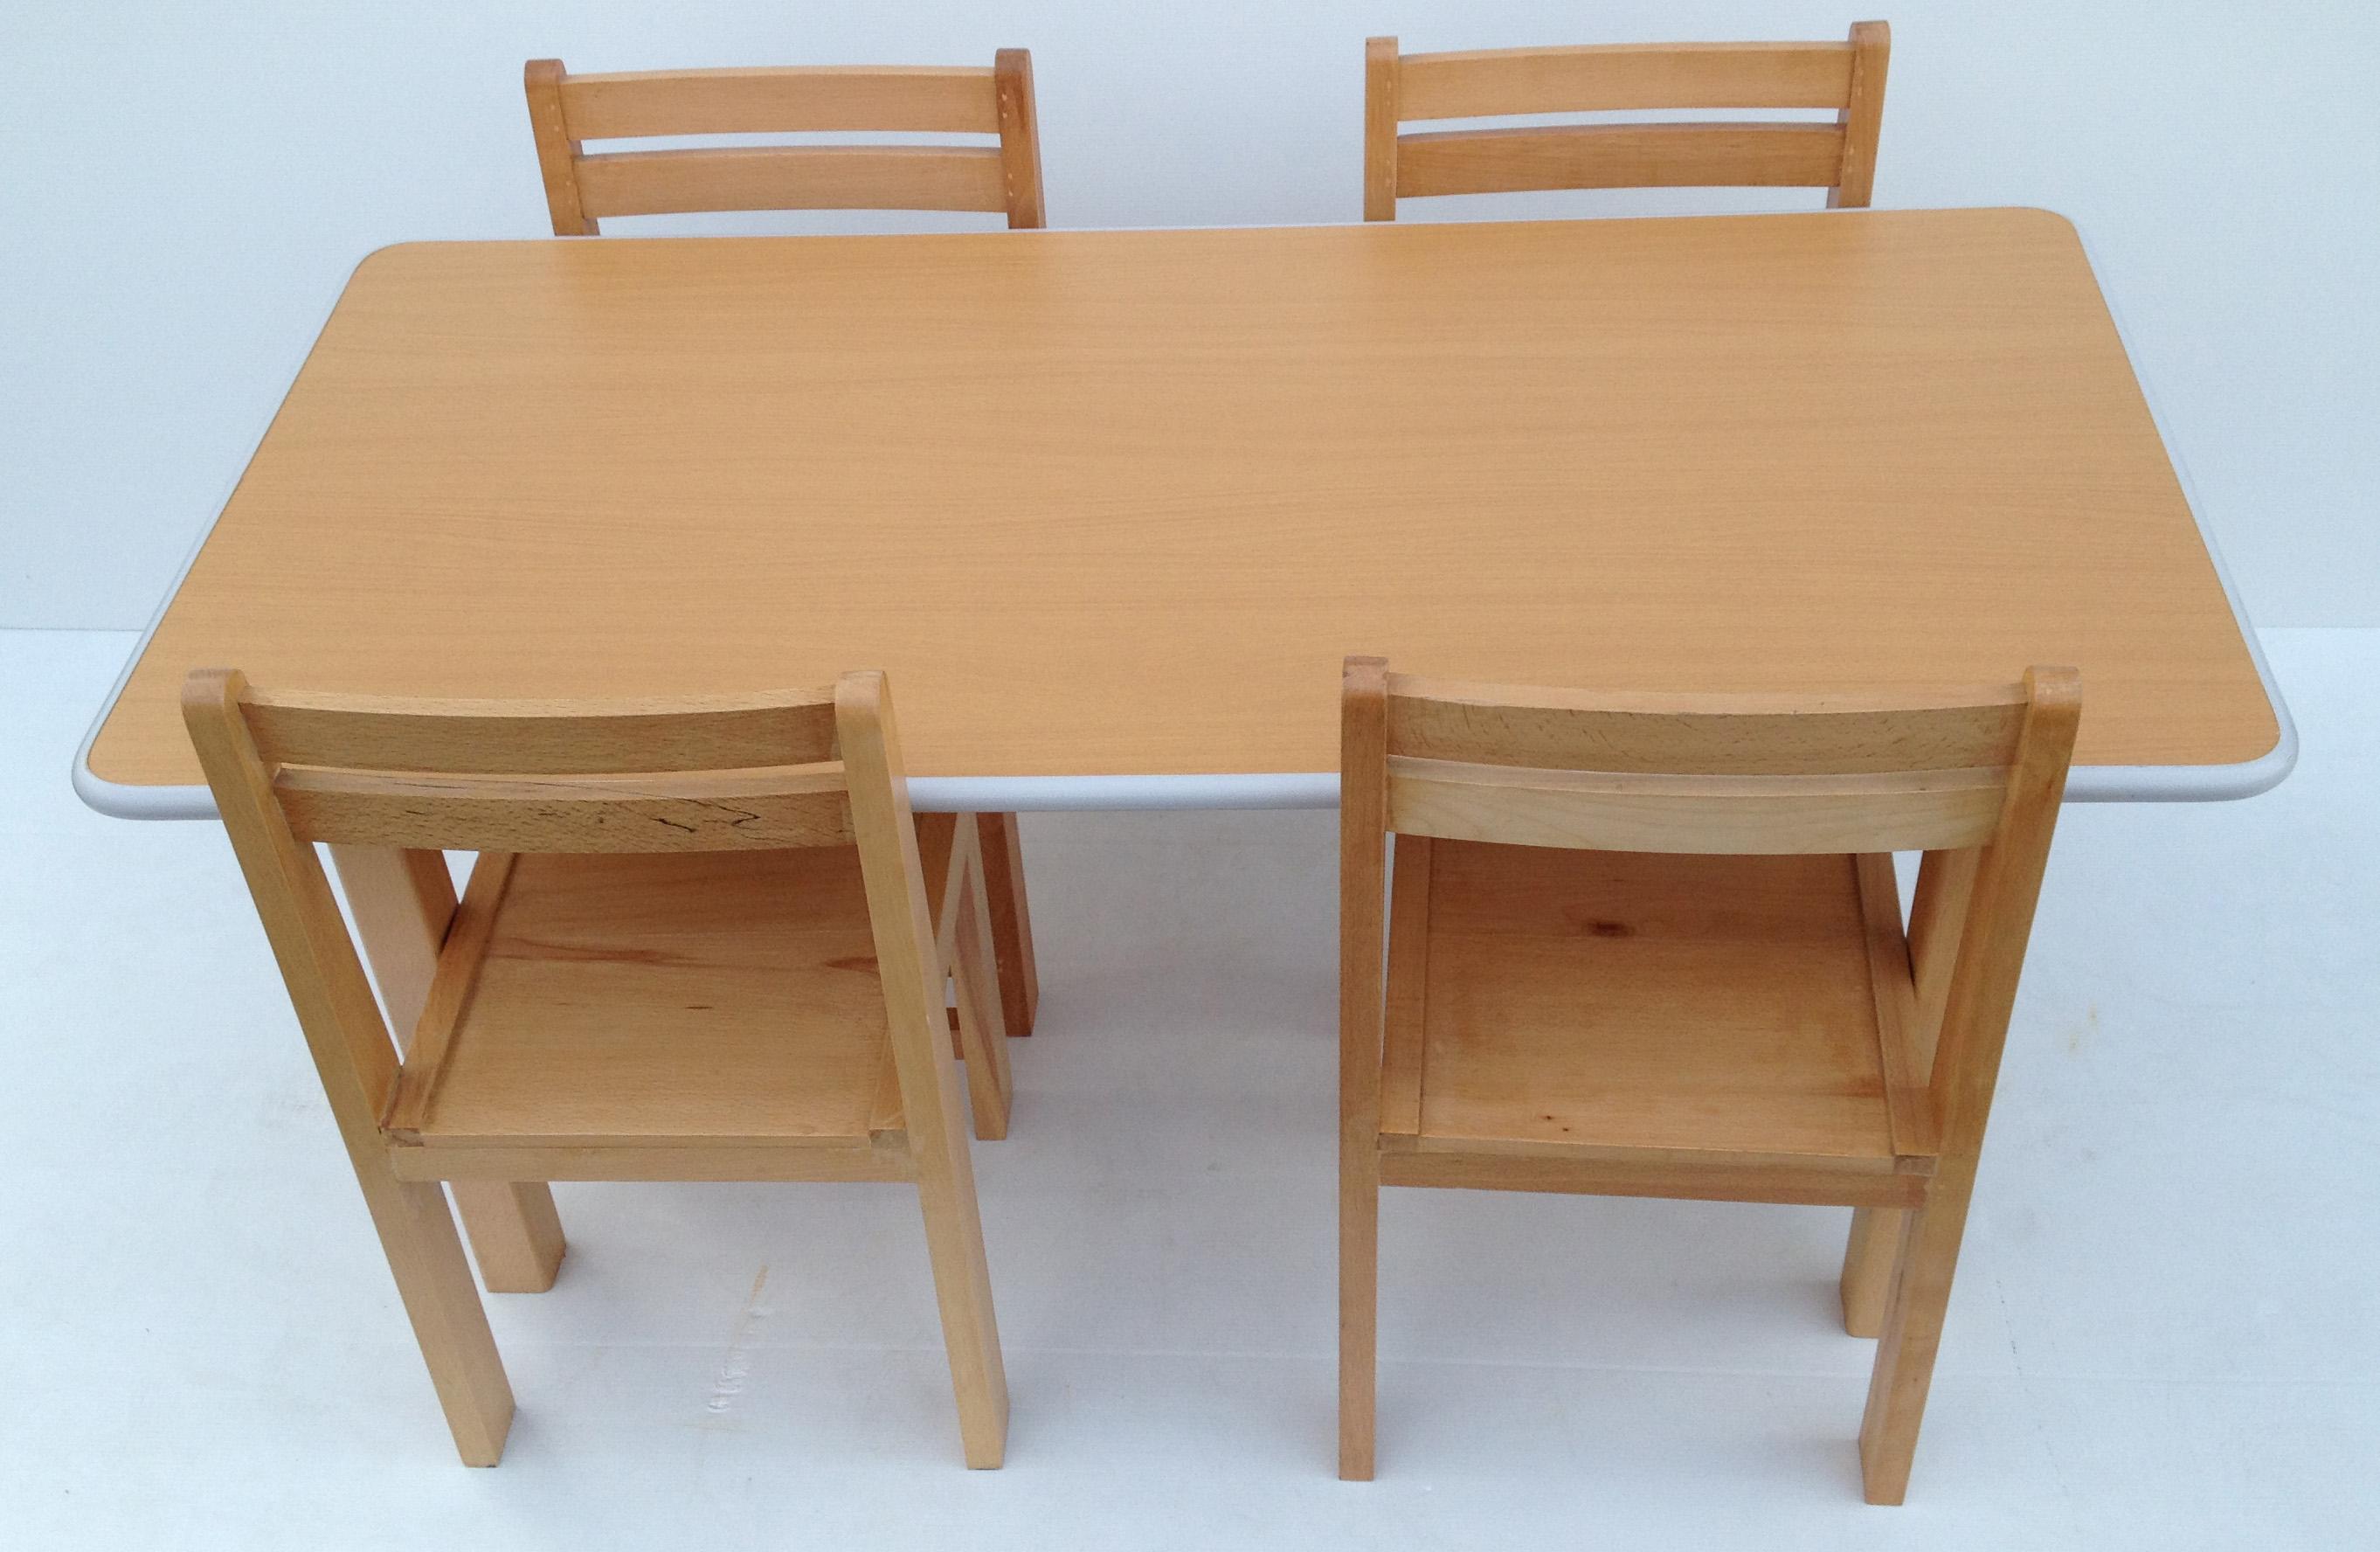 Pre School Kids Table Chairs Classroom Desk